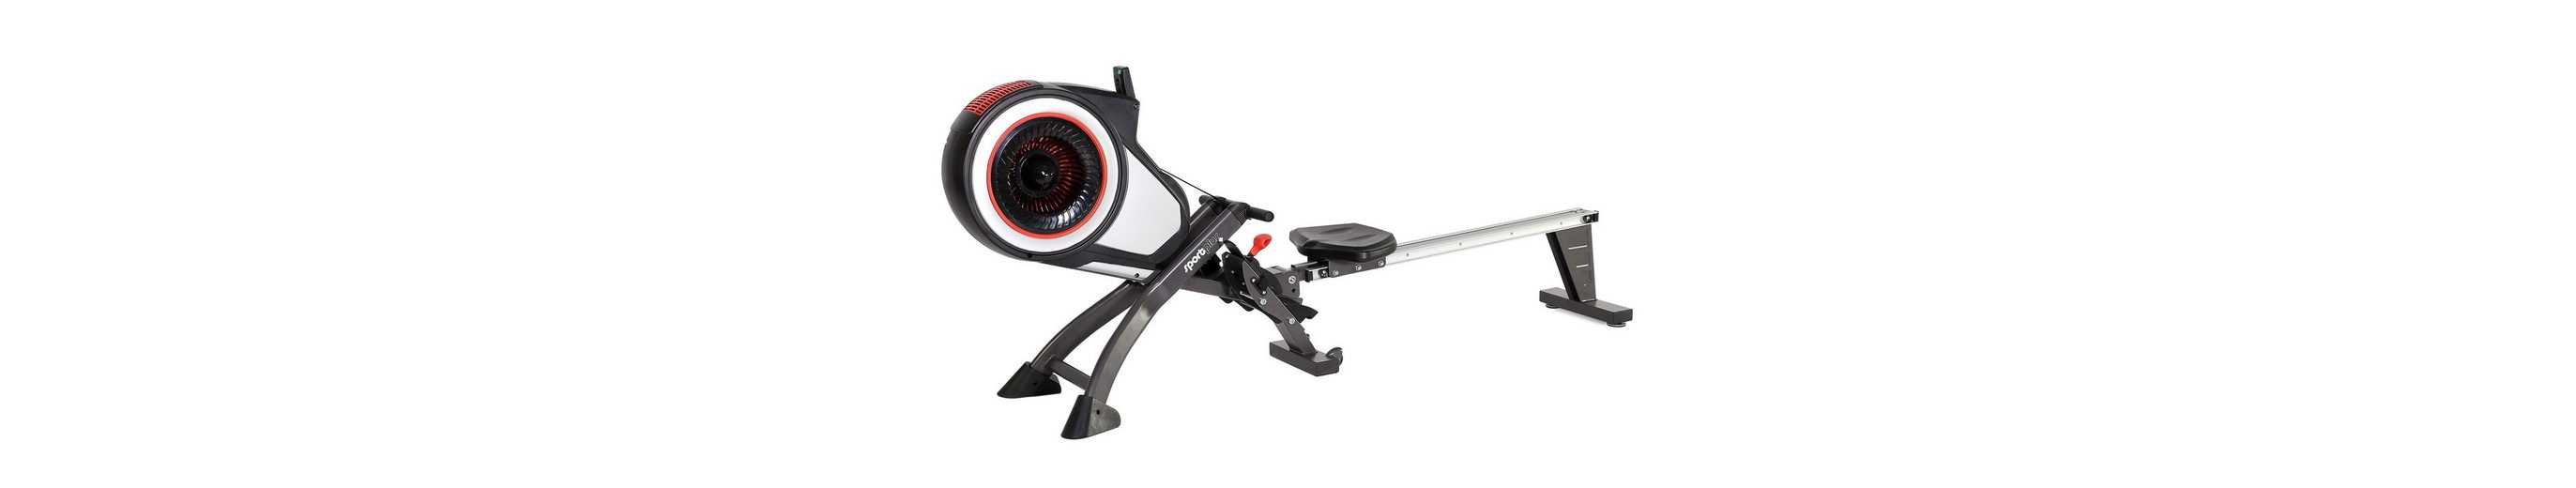 Sportplus Rudermaschine, »Turbine Rower SP-MR-010«